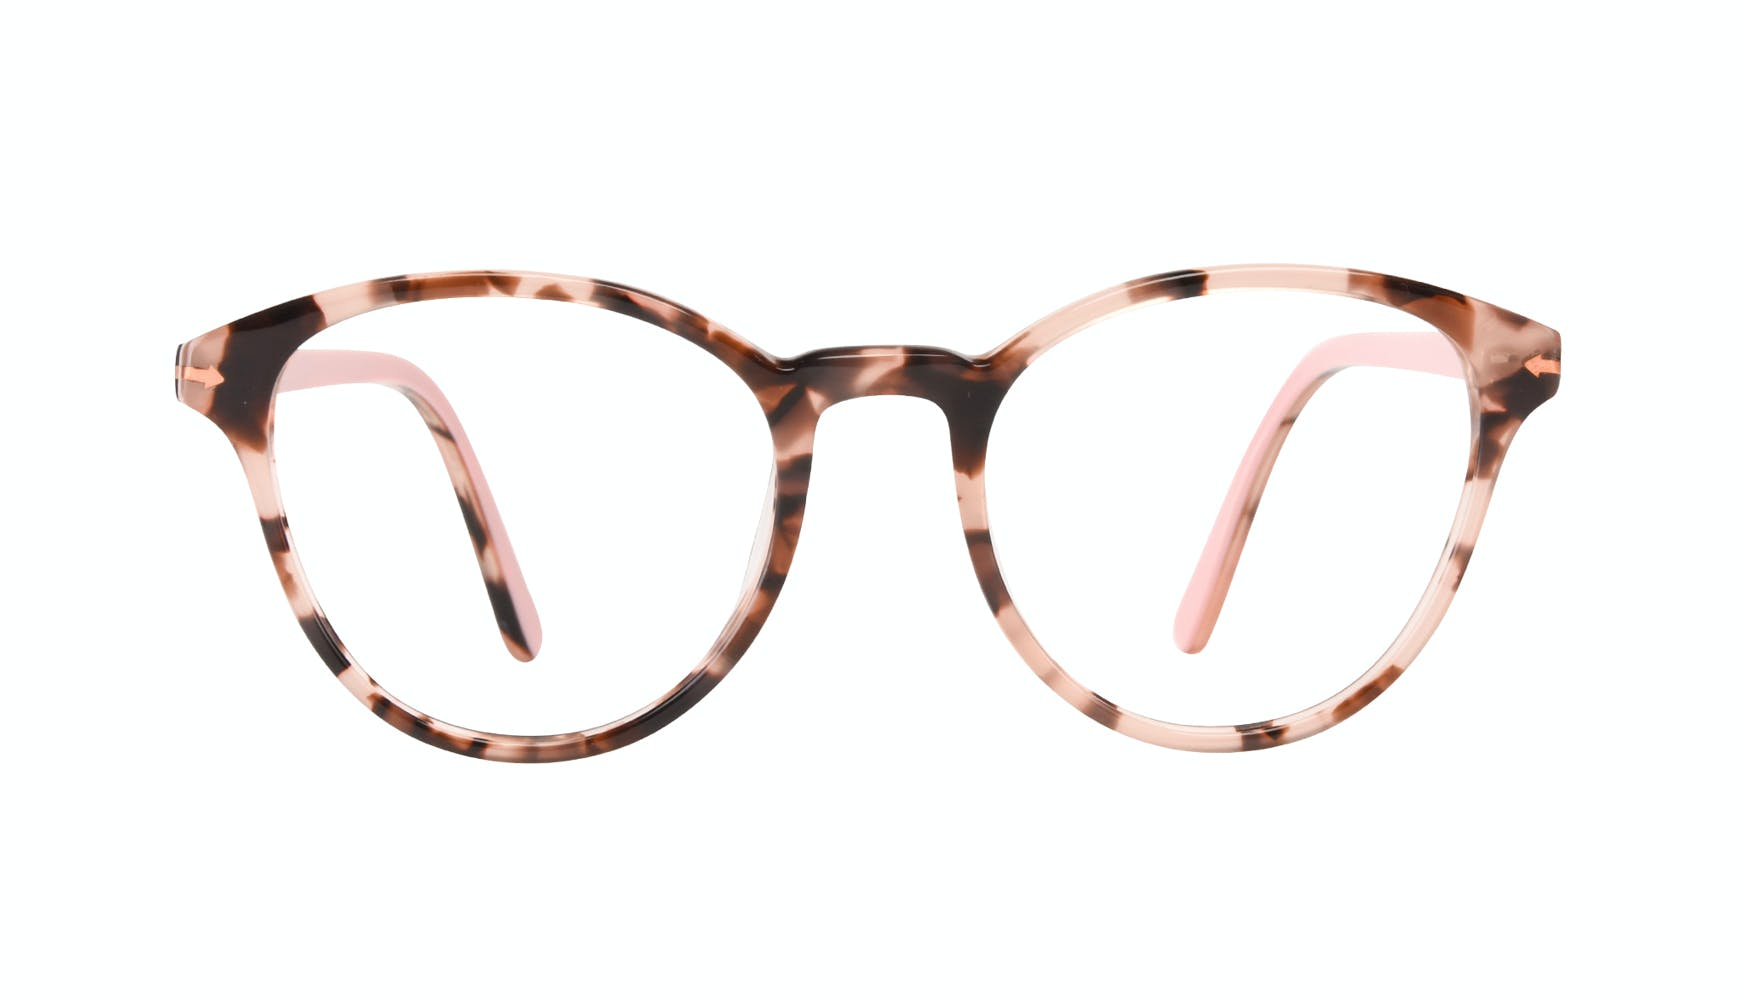 Affordable Fashion Glasses Round Eyeglasses Women London Wisteria Front